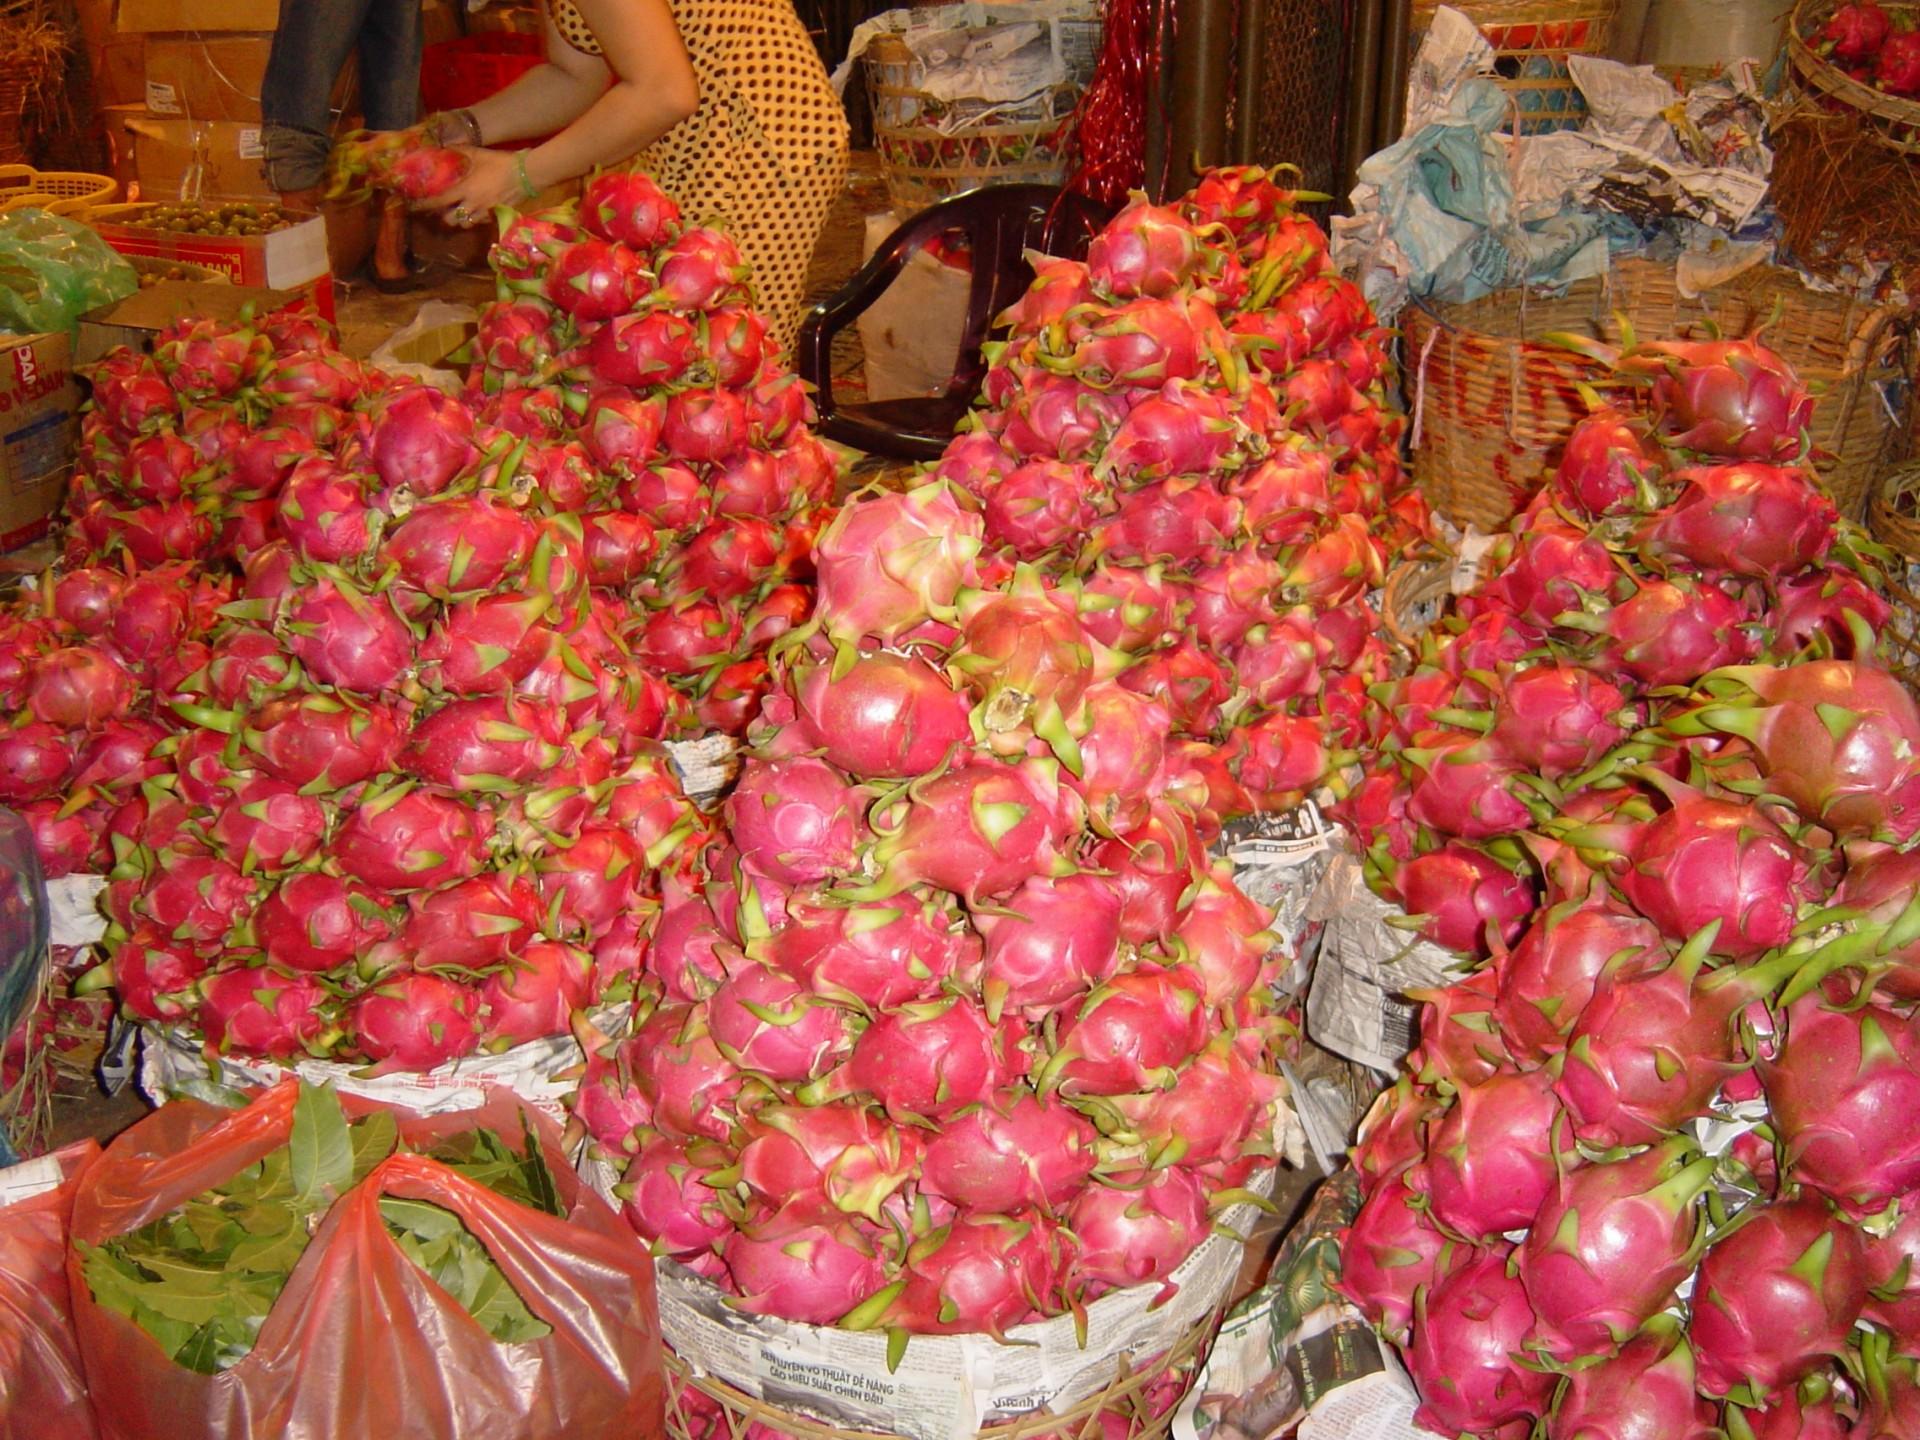 Xuất khẩu rau quả rất khả quan